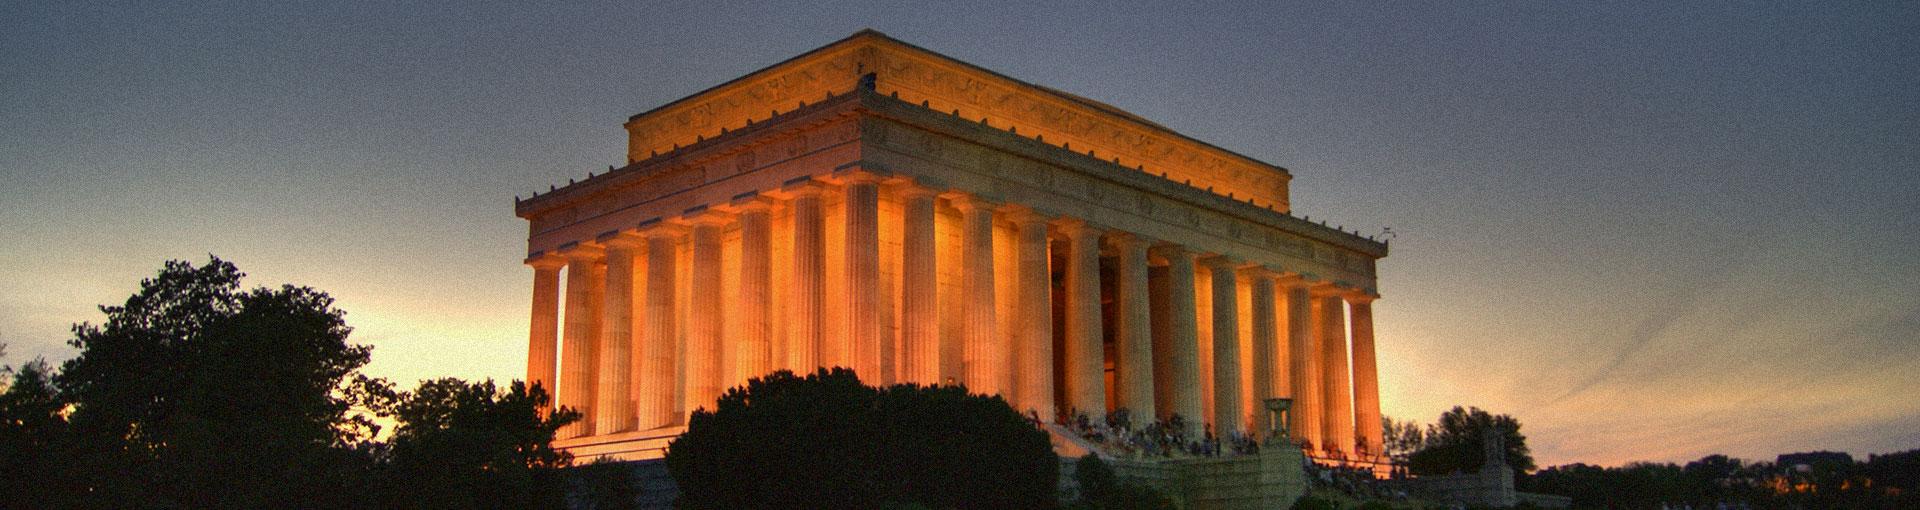 Lincoln_Memorial_(8blur)